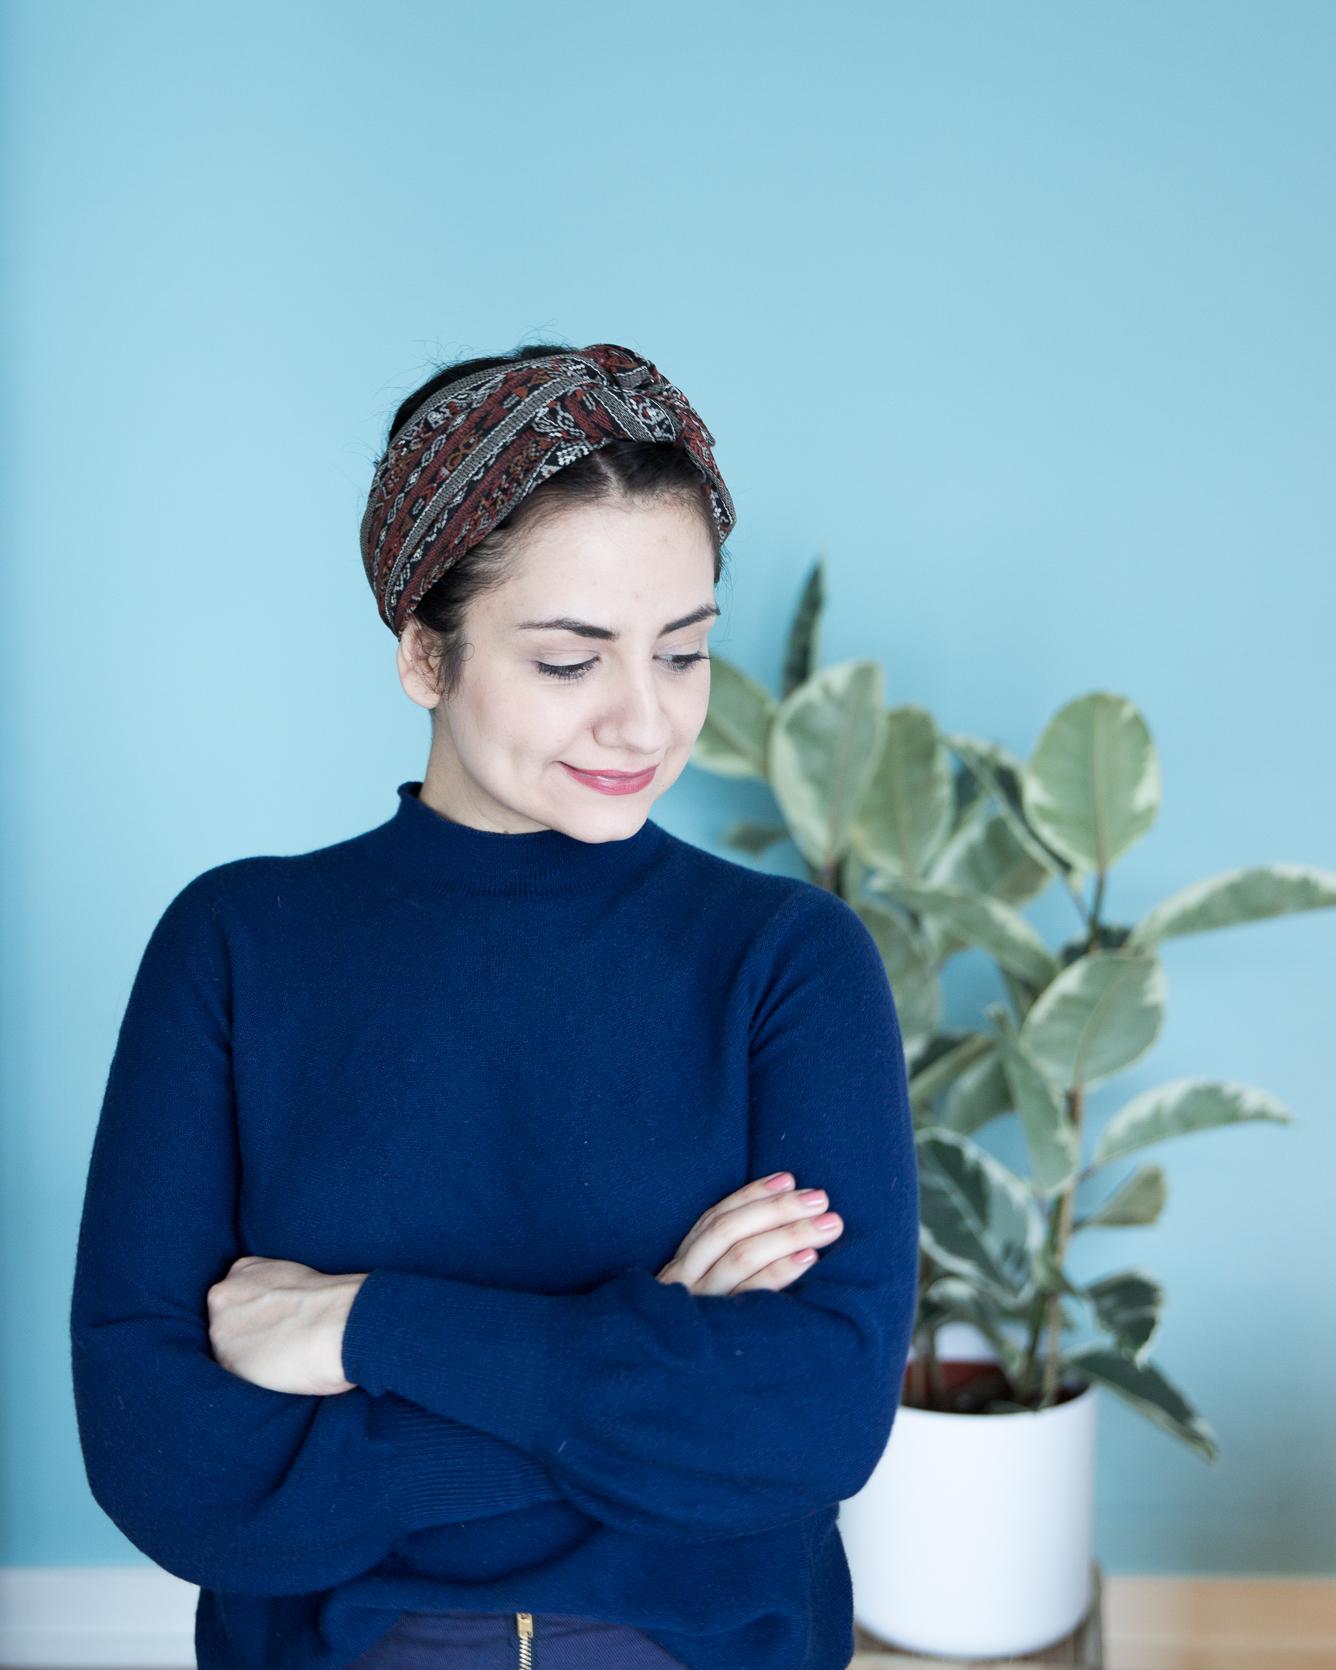 Fransenschal selbermachen - Tweed & Greet